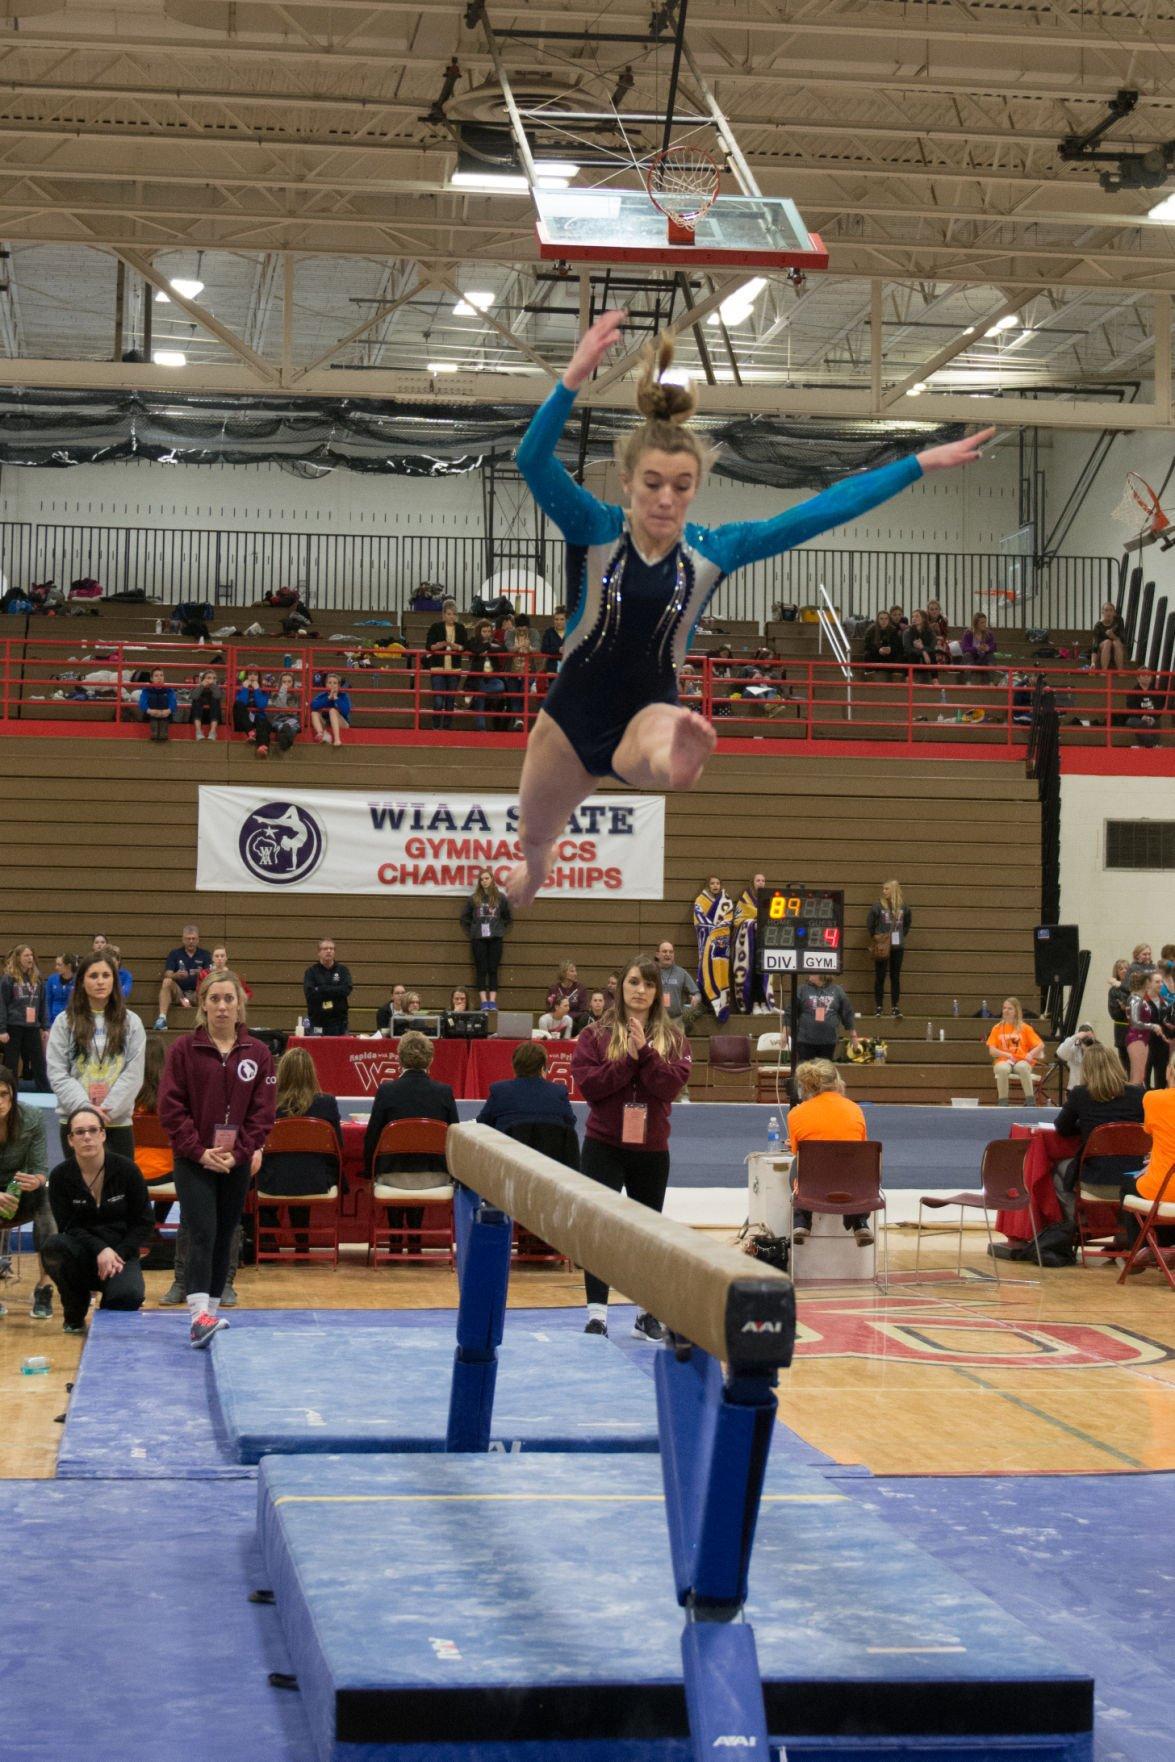 WIAA state gymnastics: Middleton's Madeline Pflasterer-Jennerjohn competes on beam